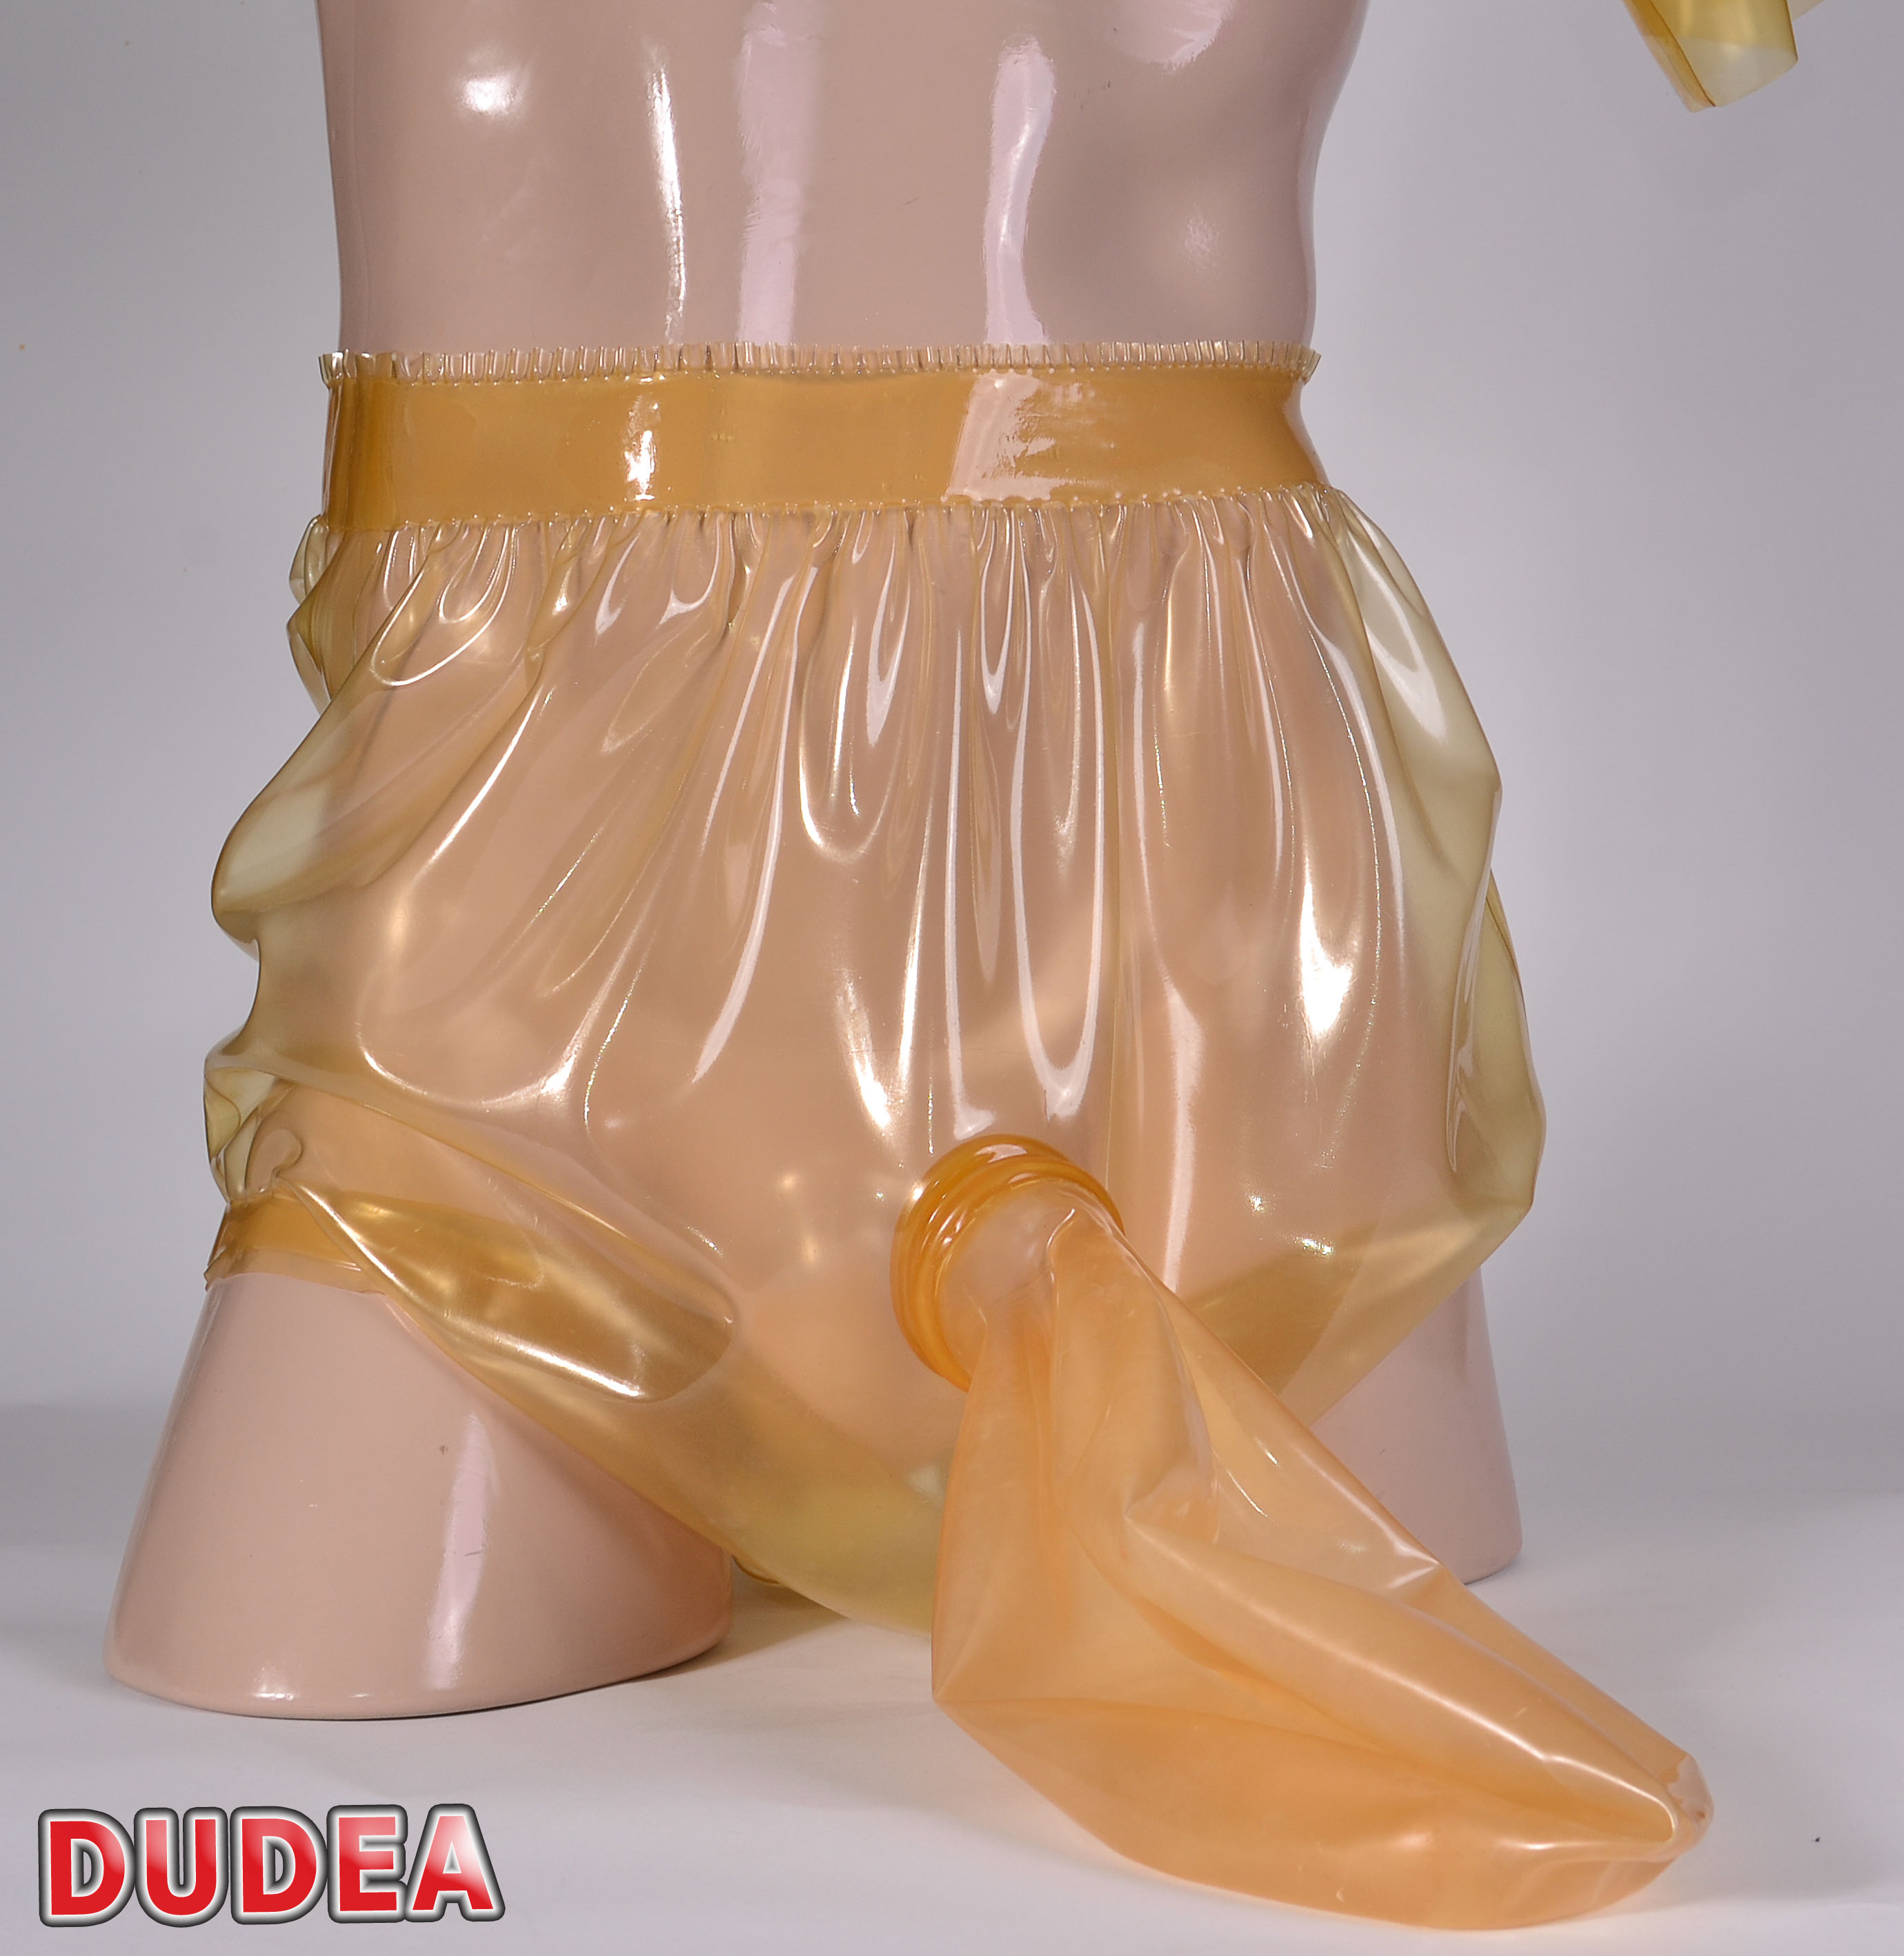 Plenkové kalhoty s penisem - Wix-Pissbeutel - DUDEA Latex a Gummishop f7d7ec660d